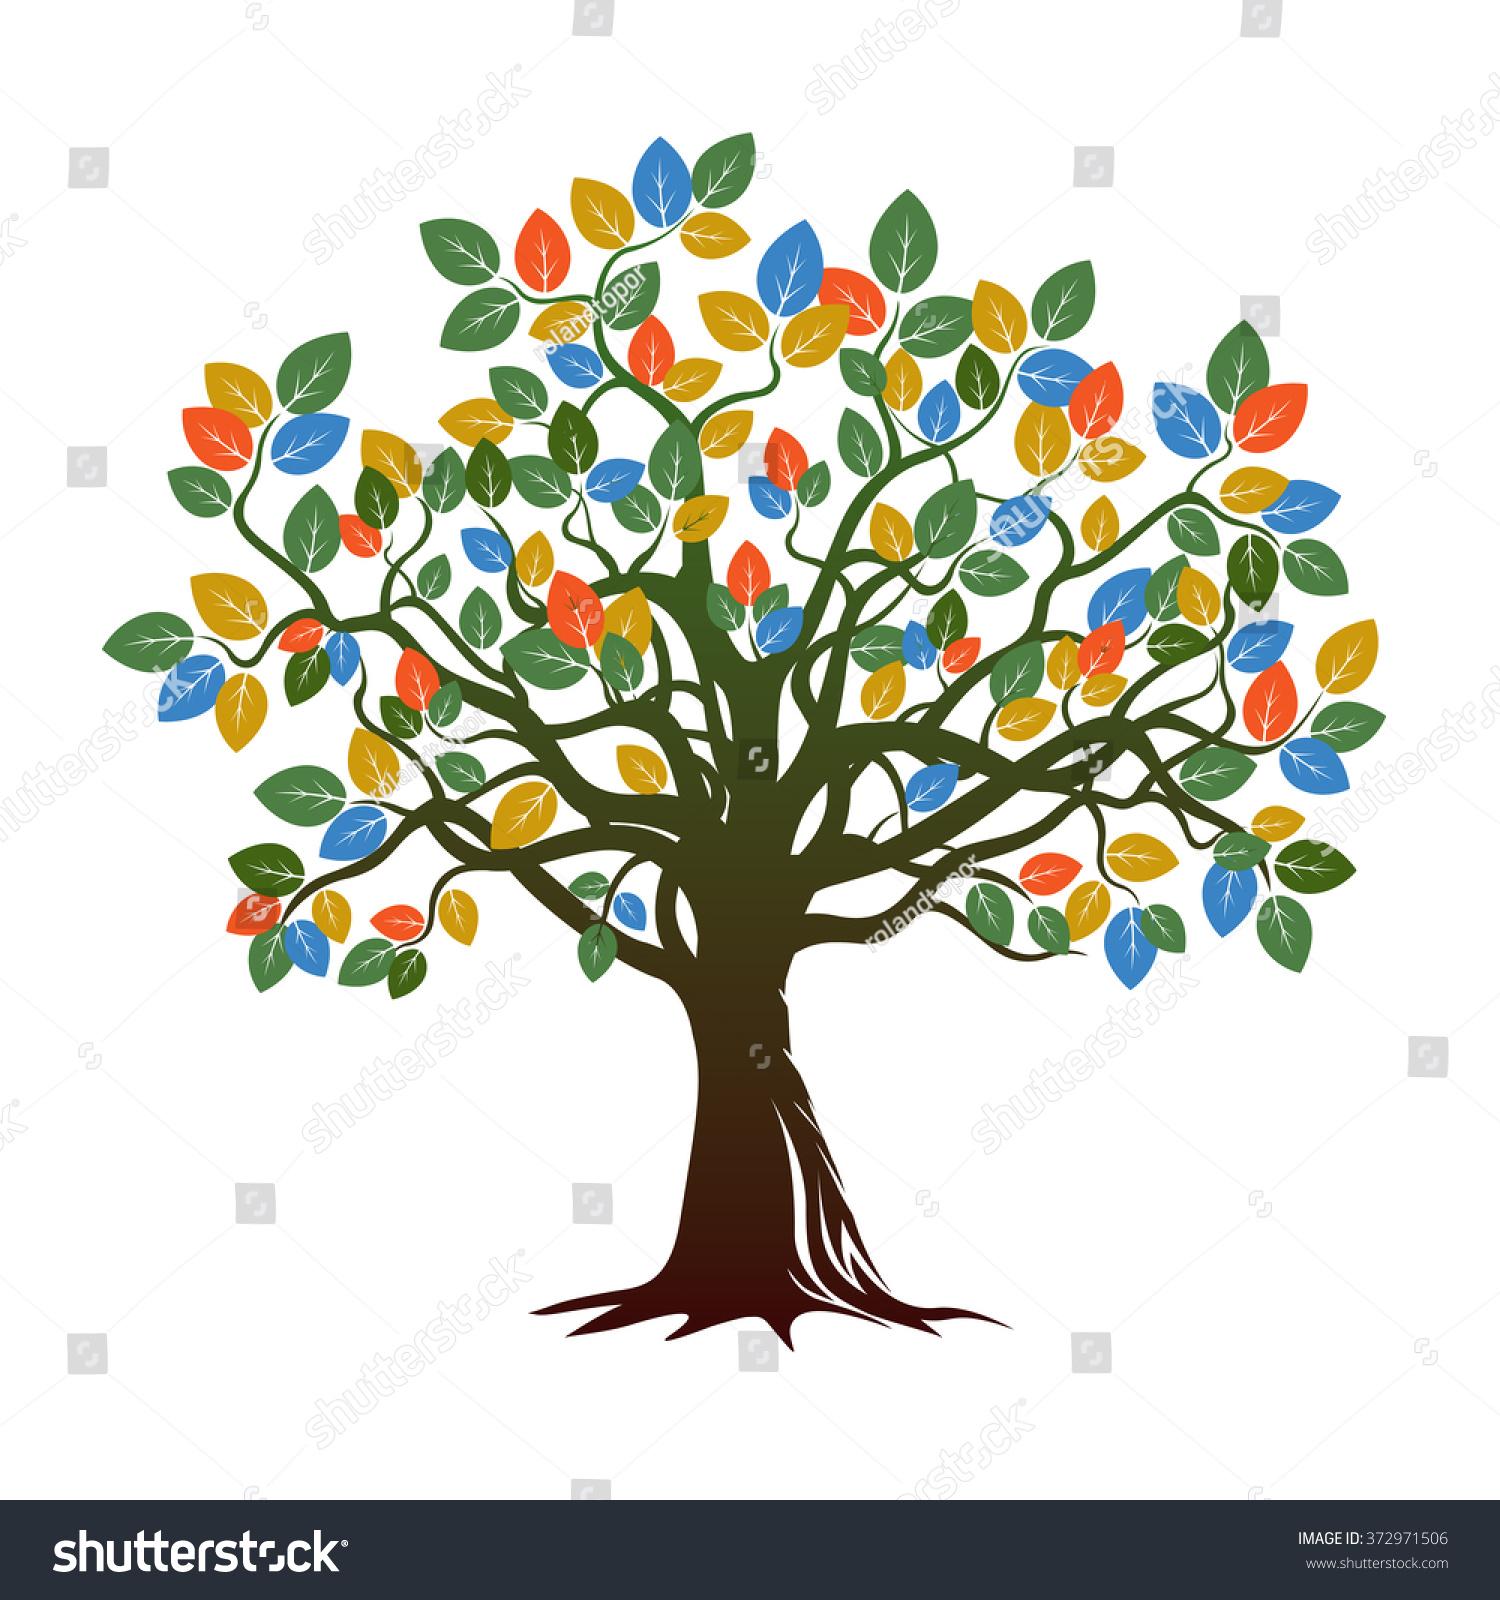 Old Color Tree Vector Illustration Stock Vector 372971506 - Shutterstock